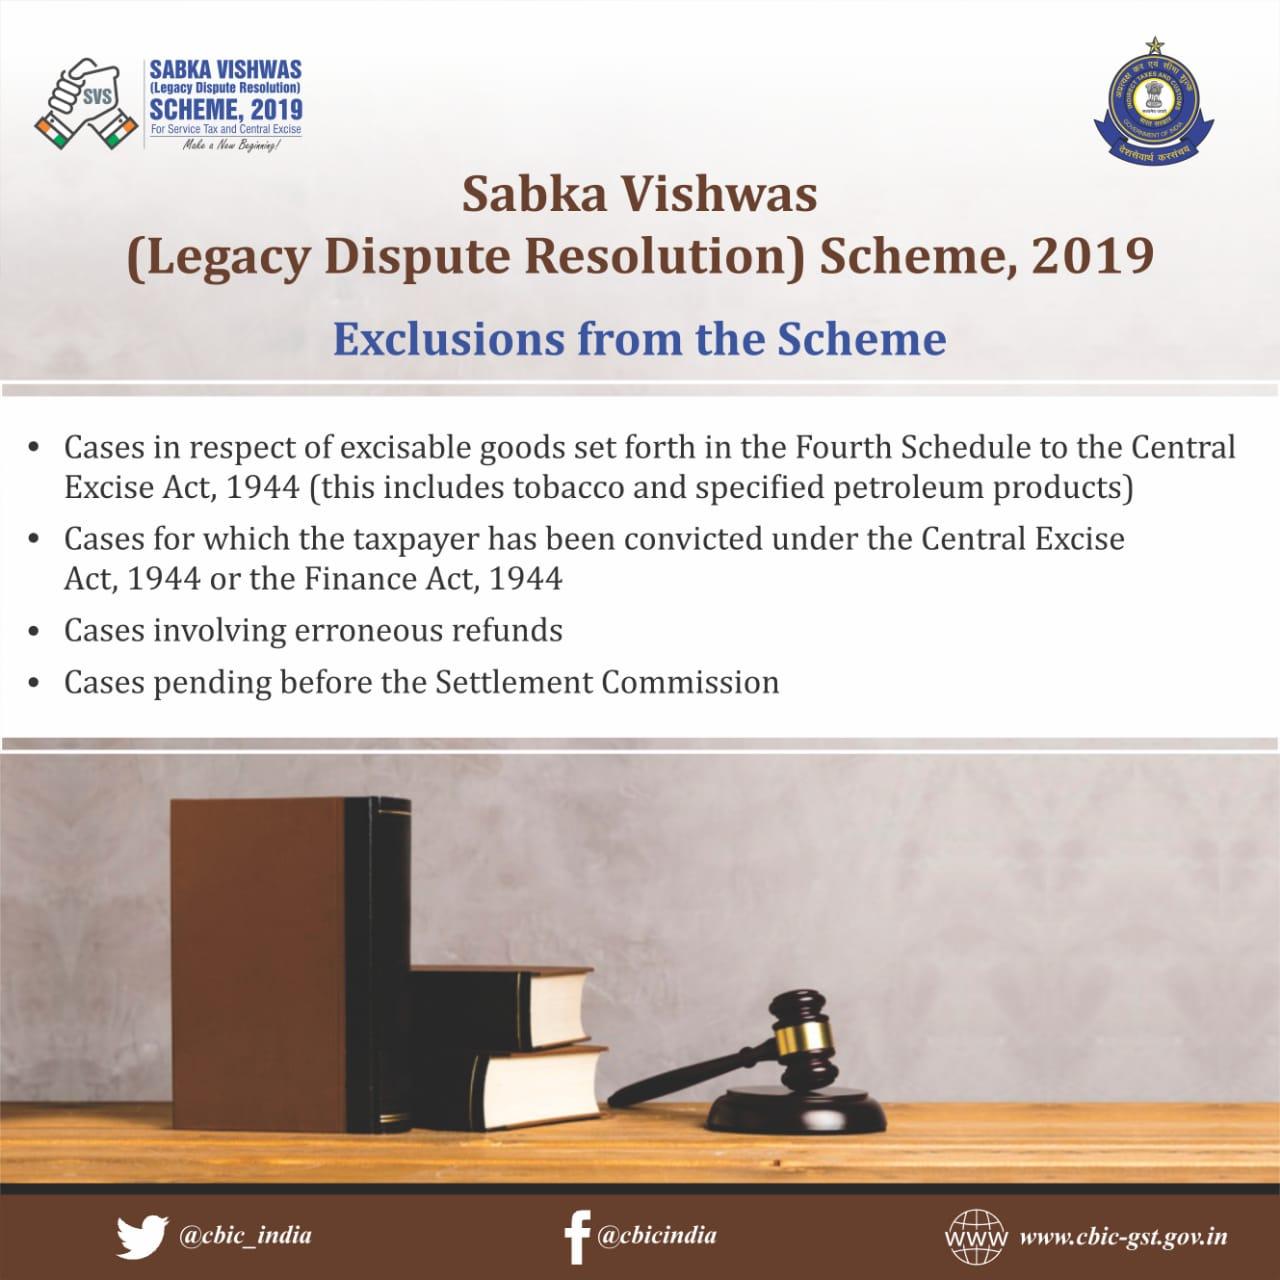 Sabka Vishwas - Legacy Dispute Resolution Scheme notified